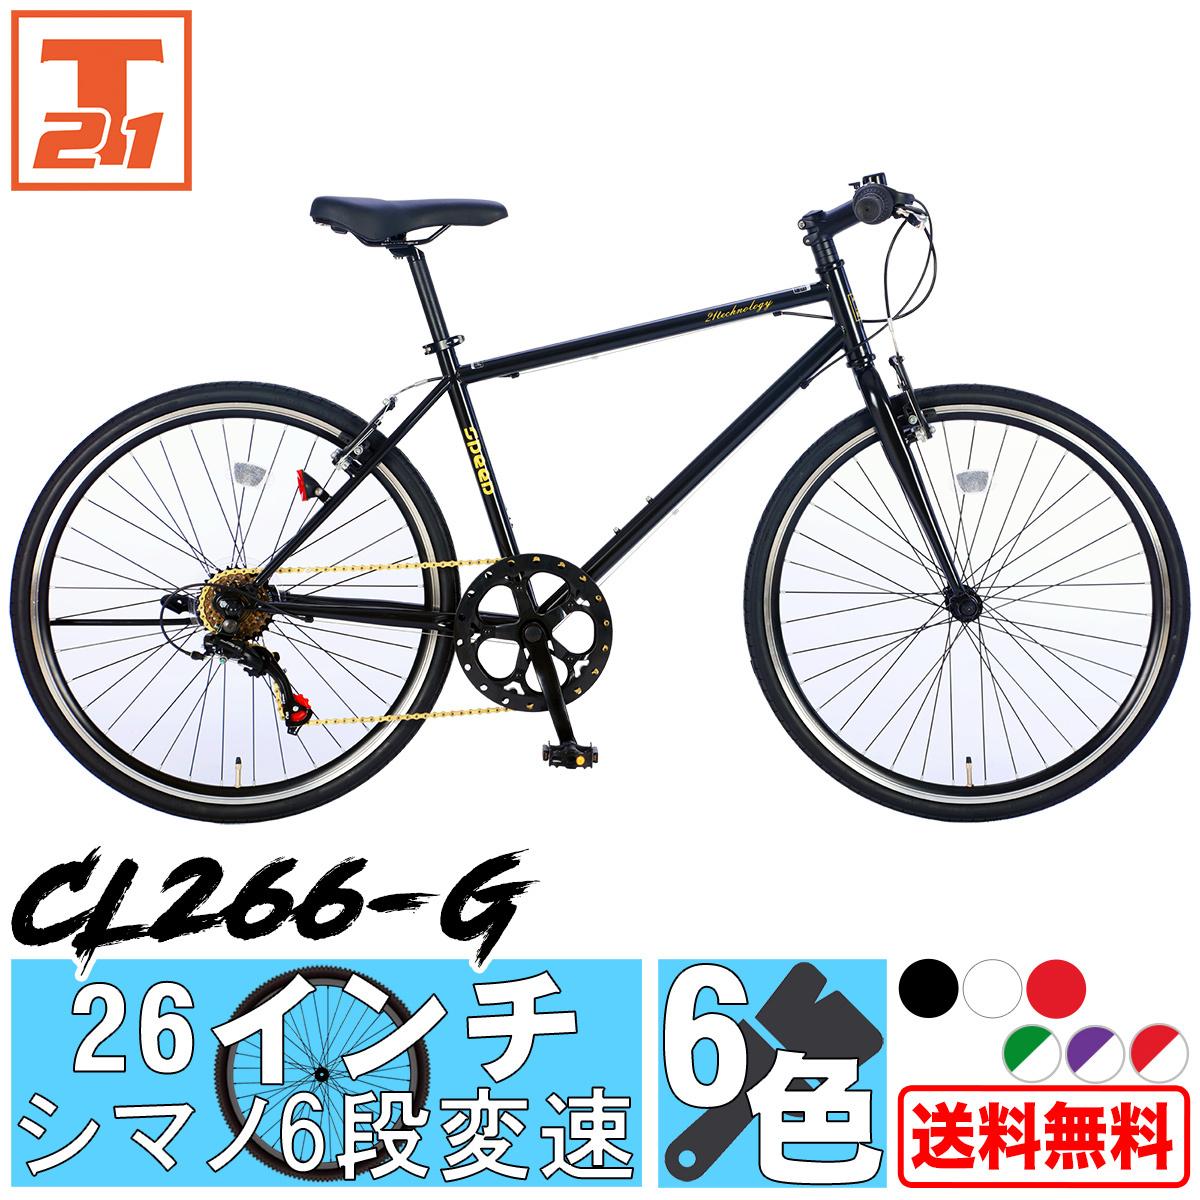 CL266-G